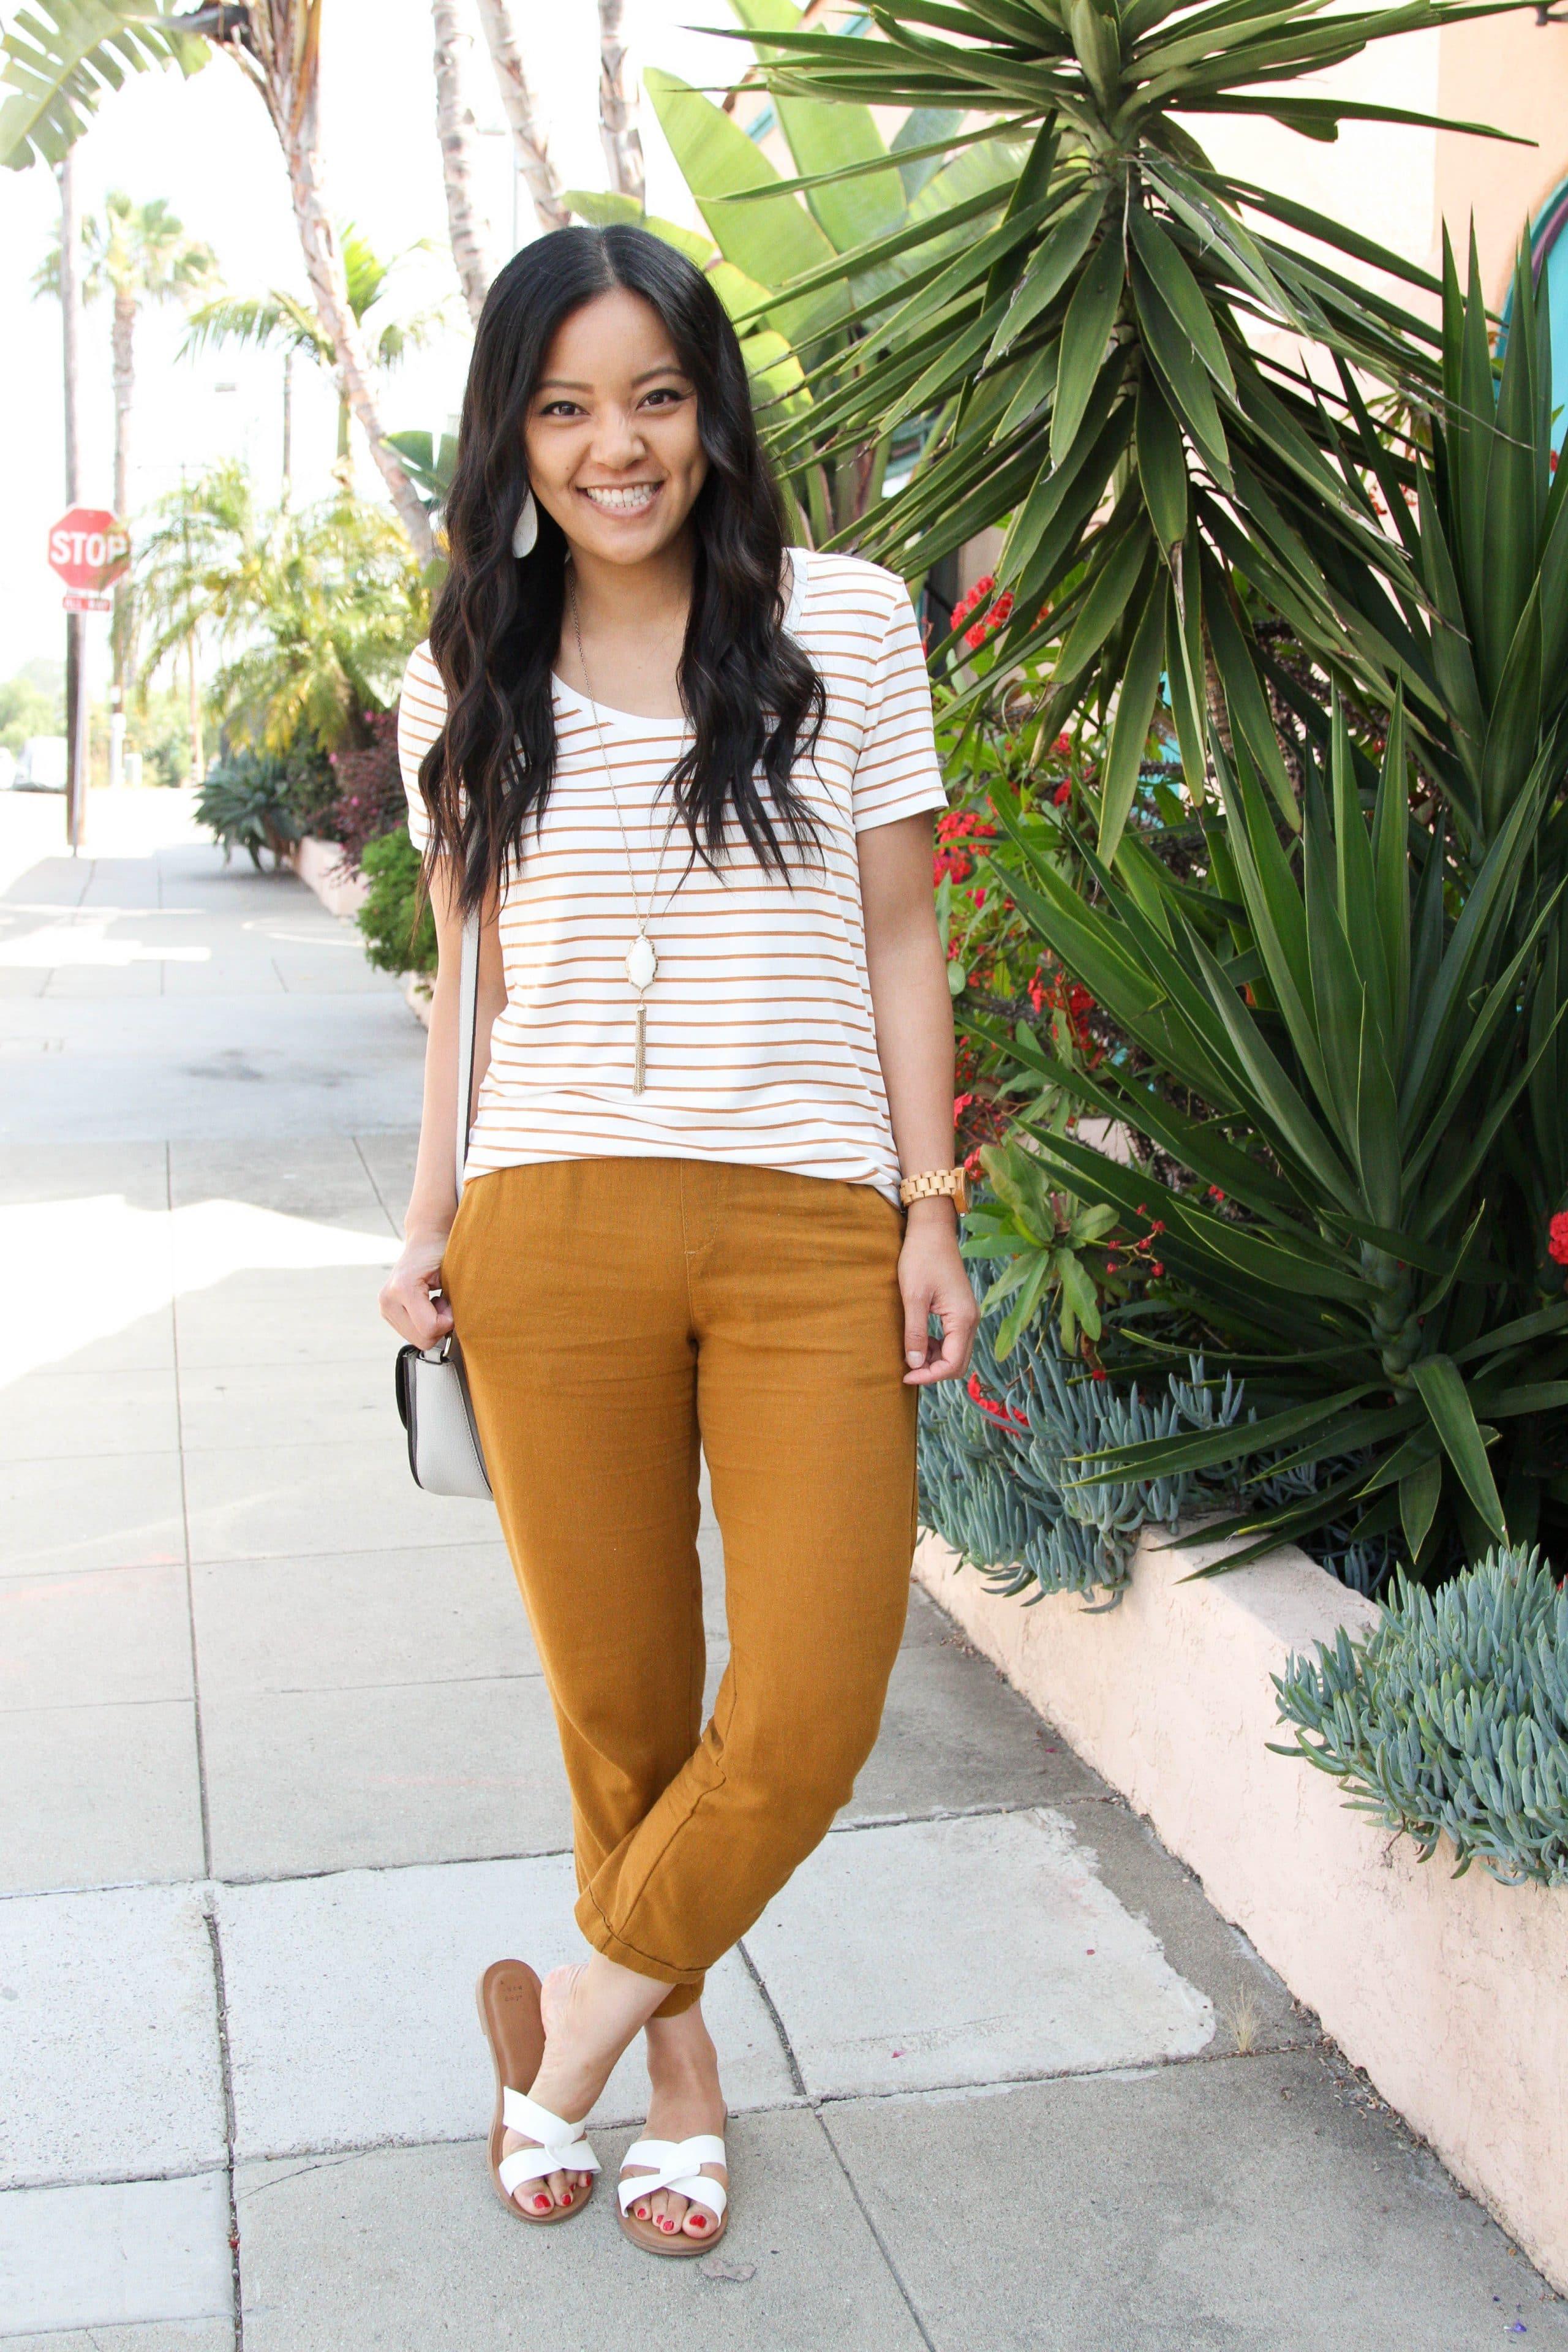 tan linen pants + striped tee + white sandals